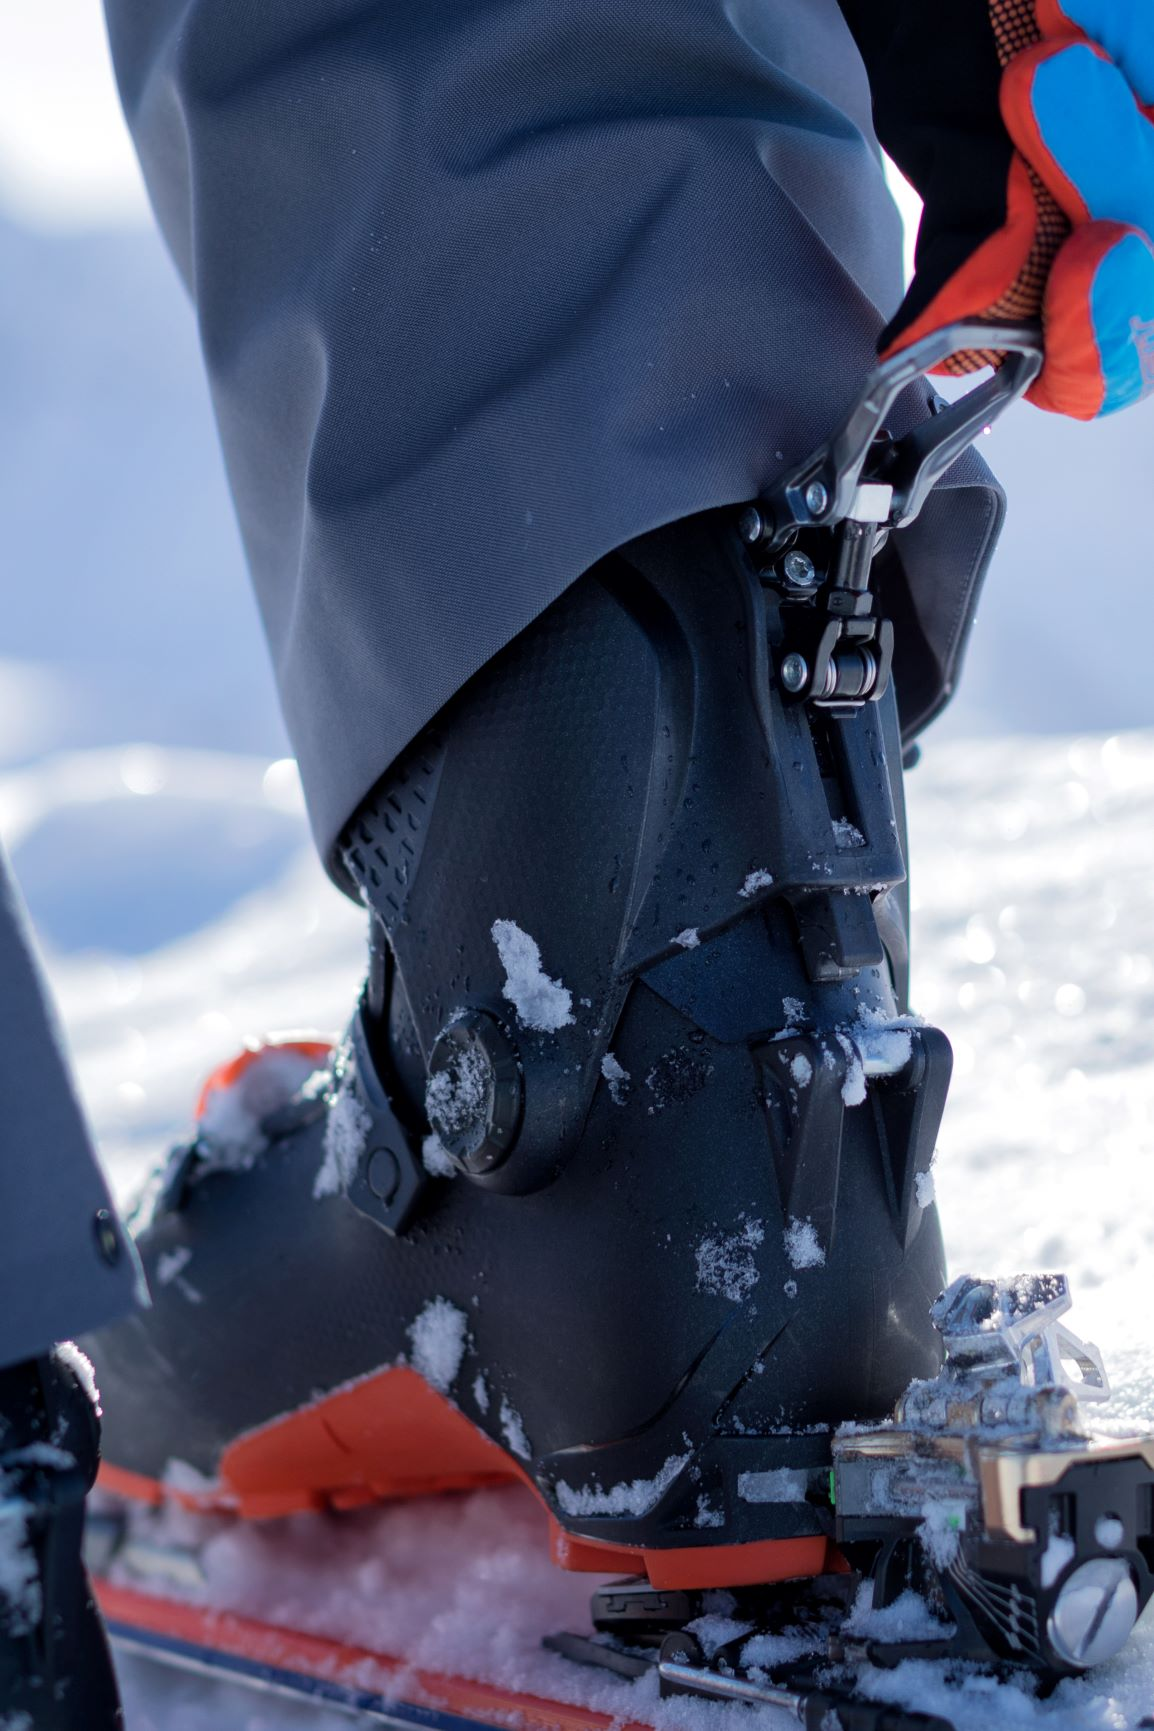 SkischuhfittingDetail